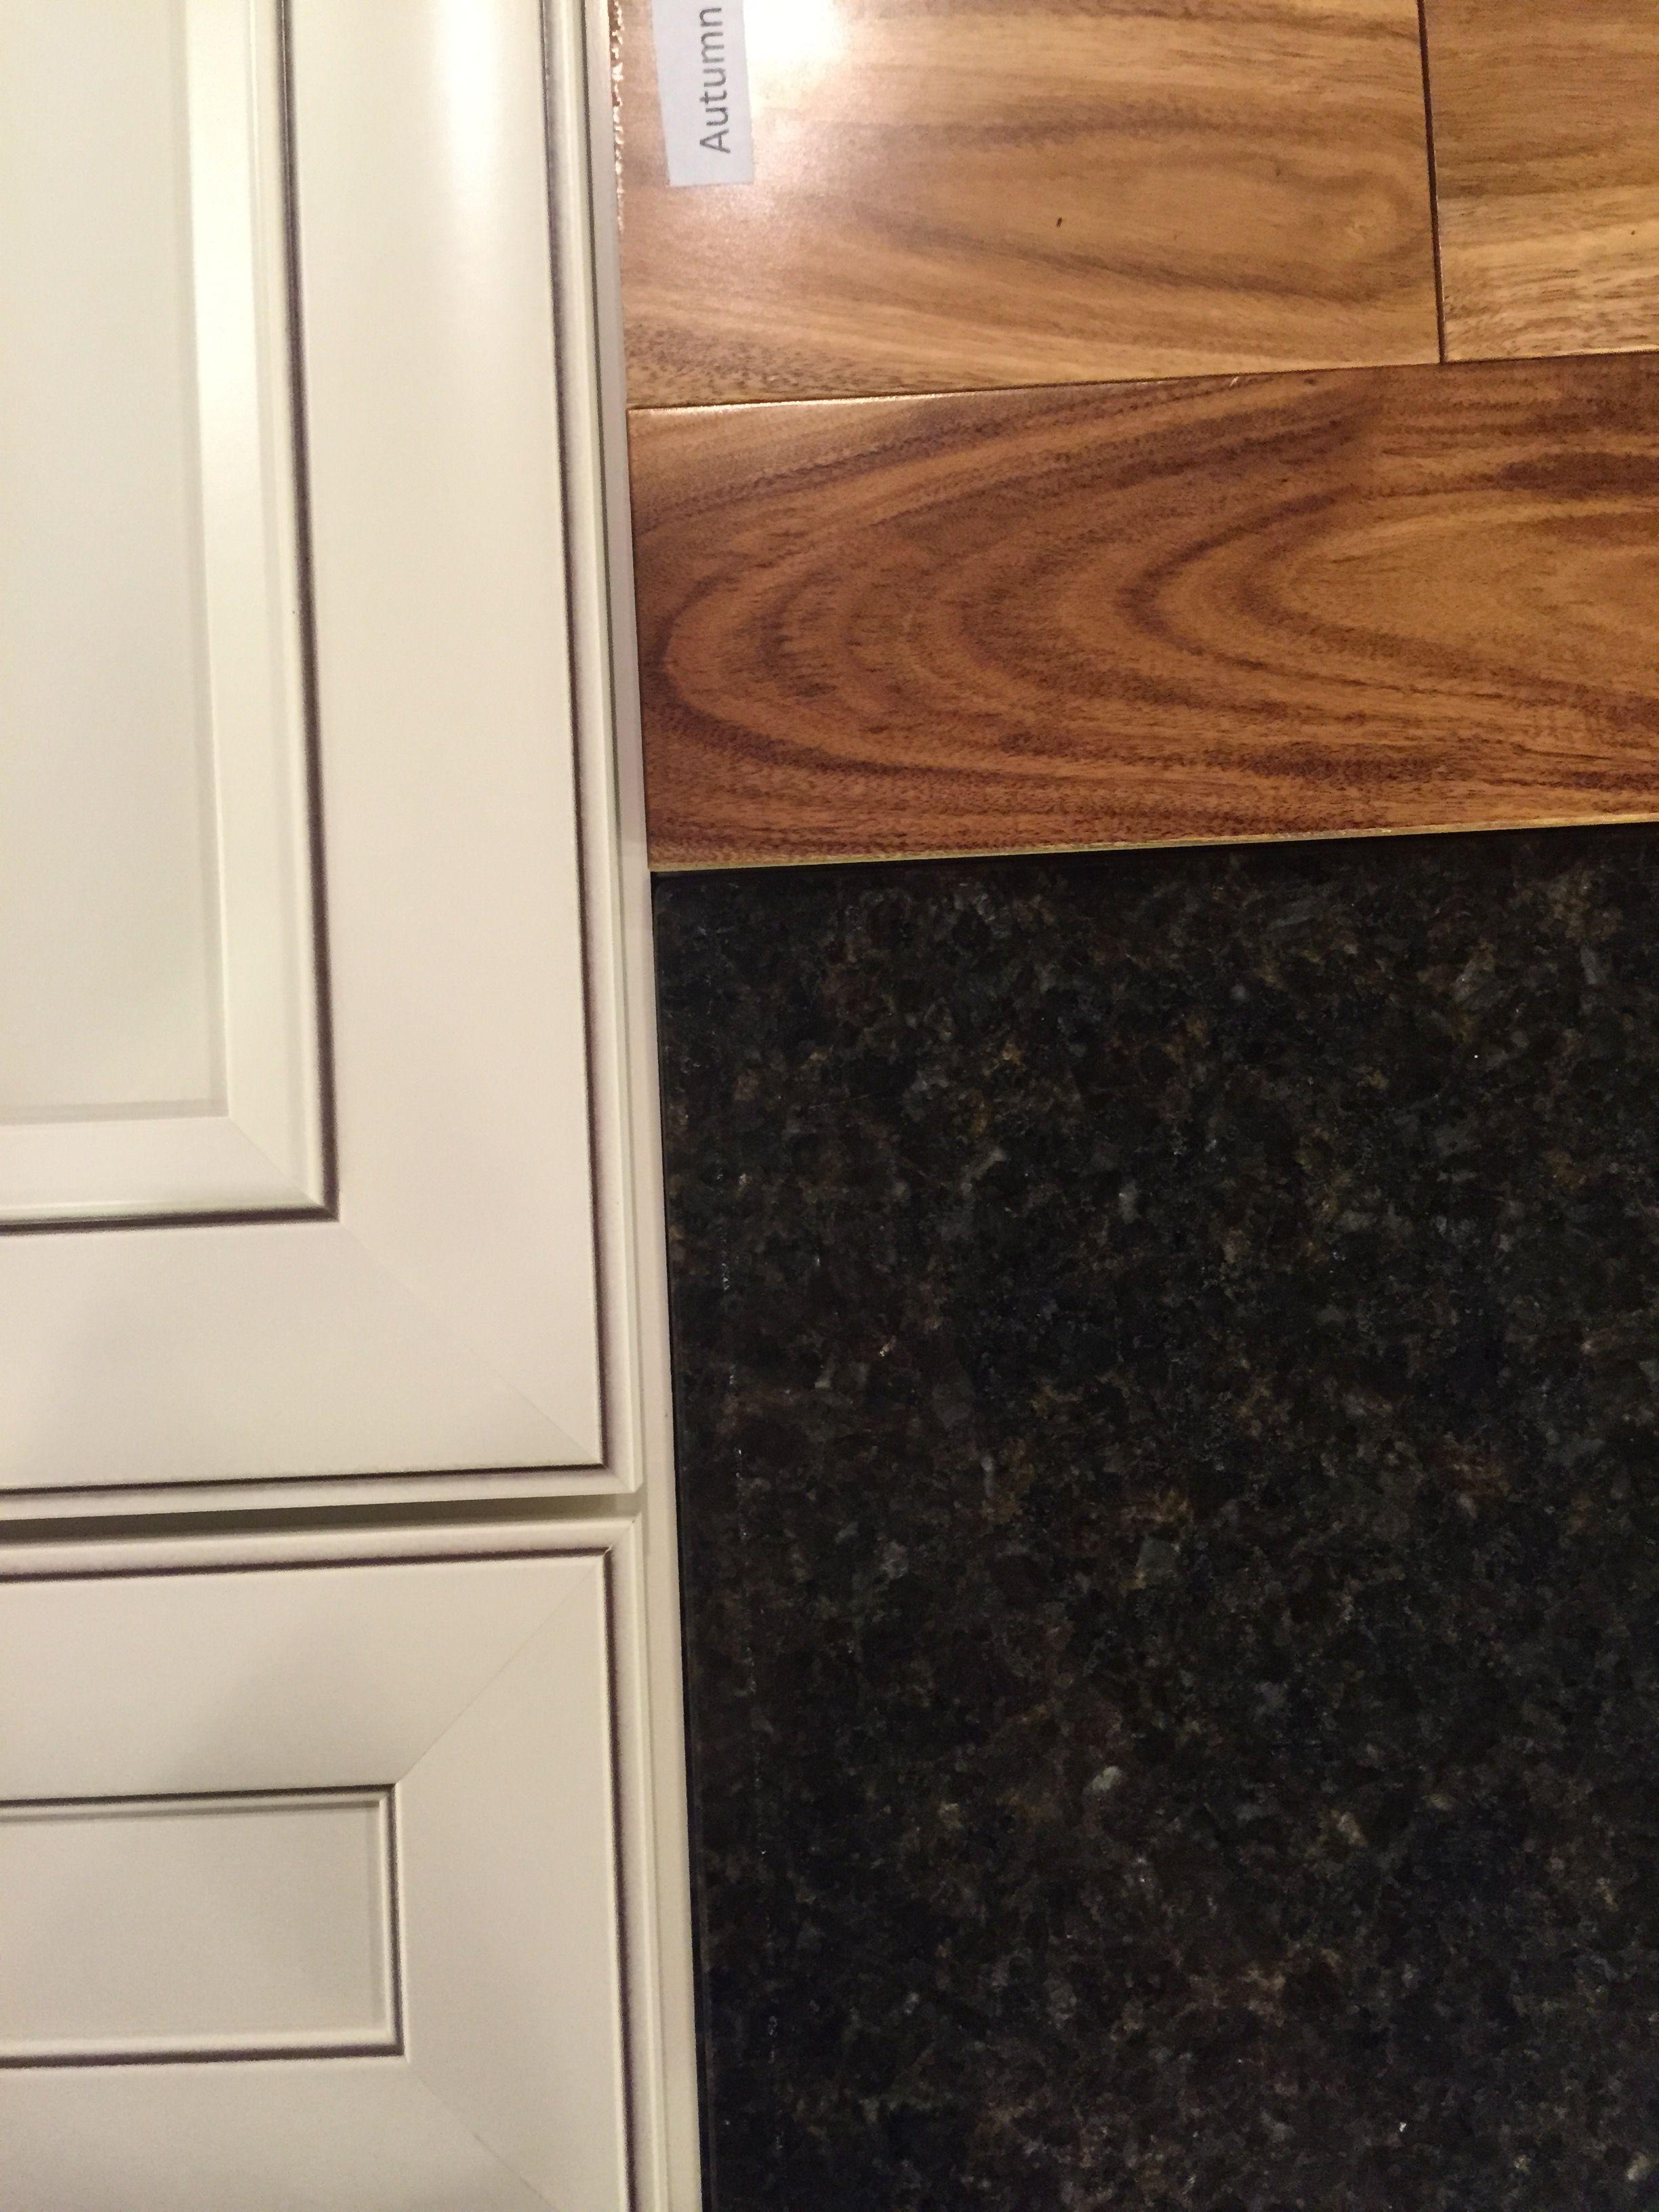 Dark uber tuber granite shown with white cabinets and manchester dark uber tuber granite shown with white cabinets and manchester wood floors in natural dailygadgetfo Images